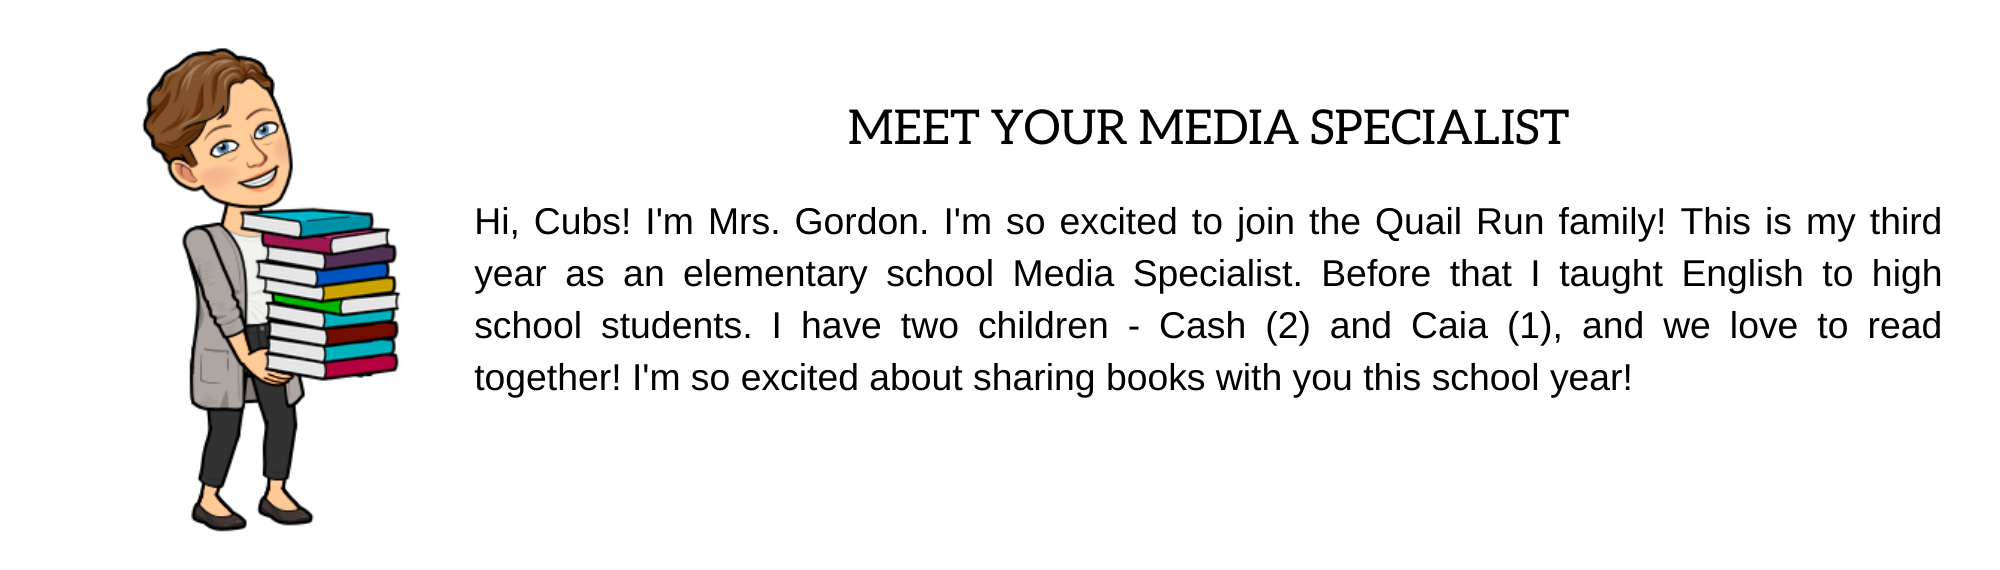 meet the media specialist